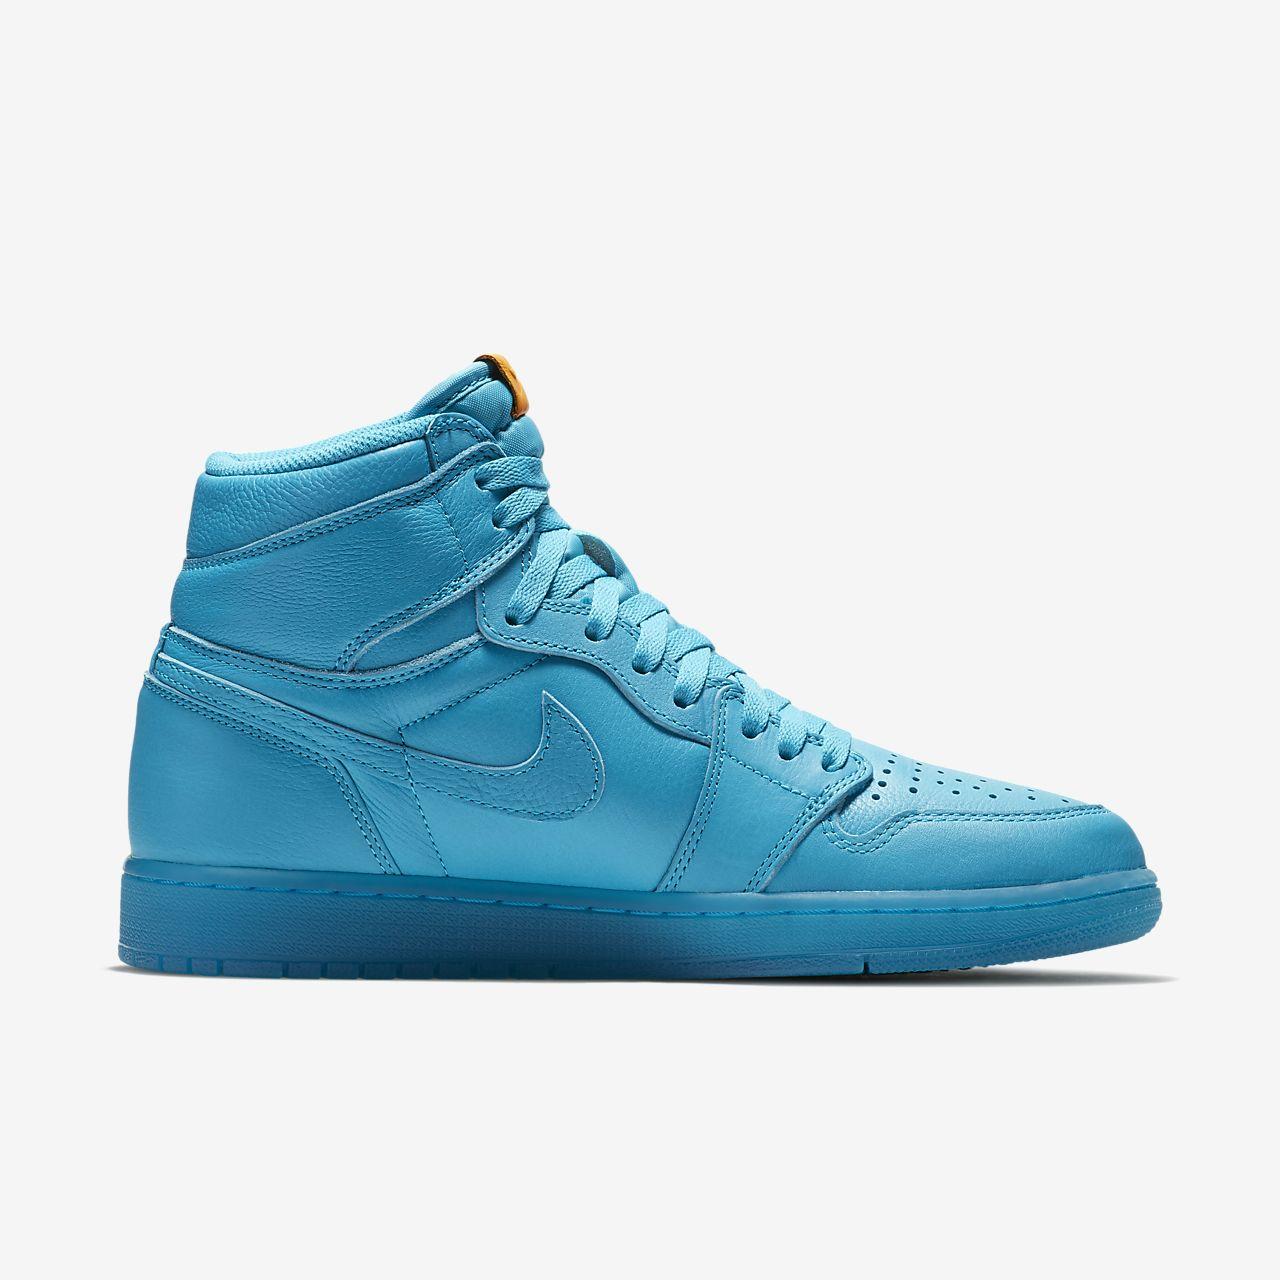 chaussure air jordan 1 retro high og